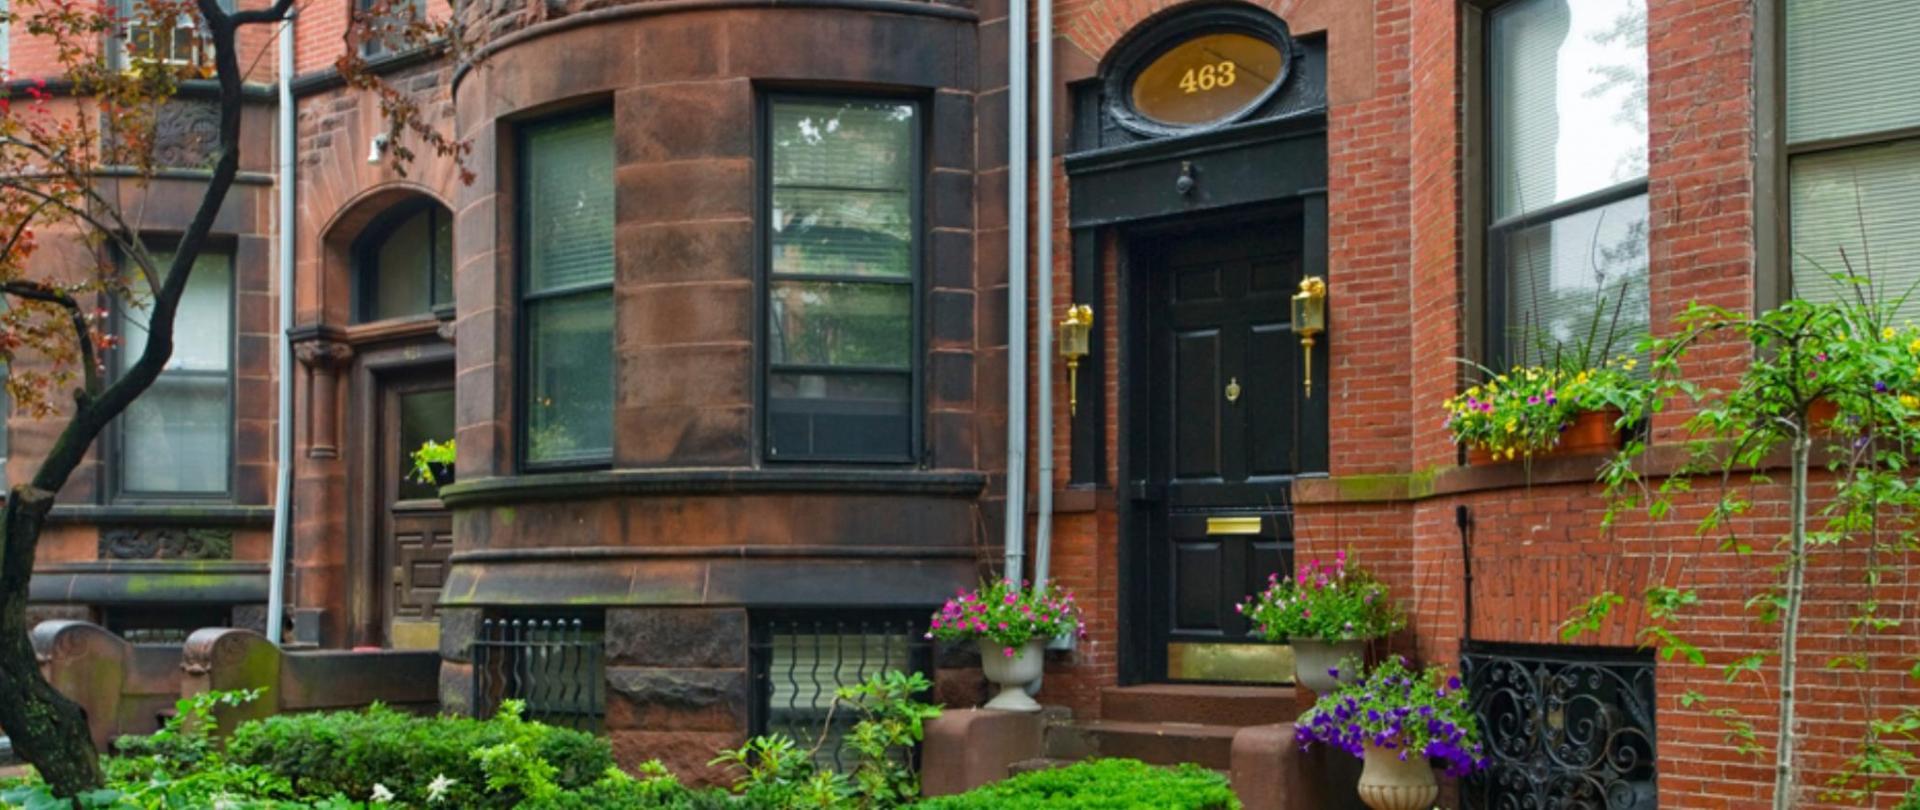 463 Beacon Street Guest House│Boston, MA